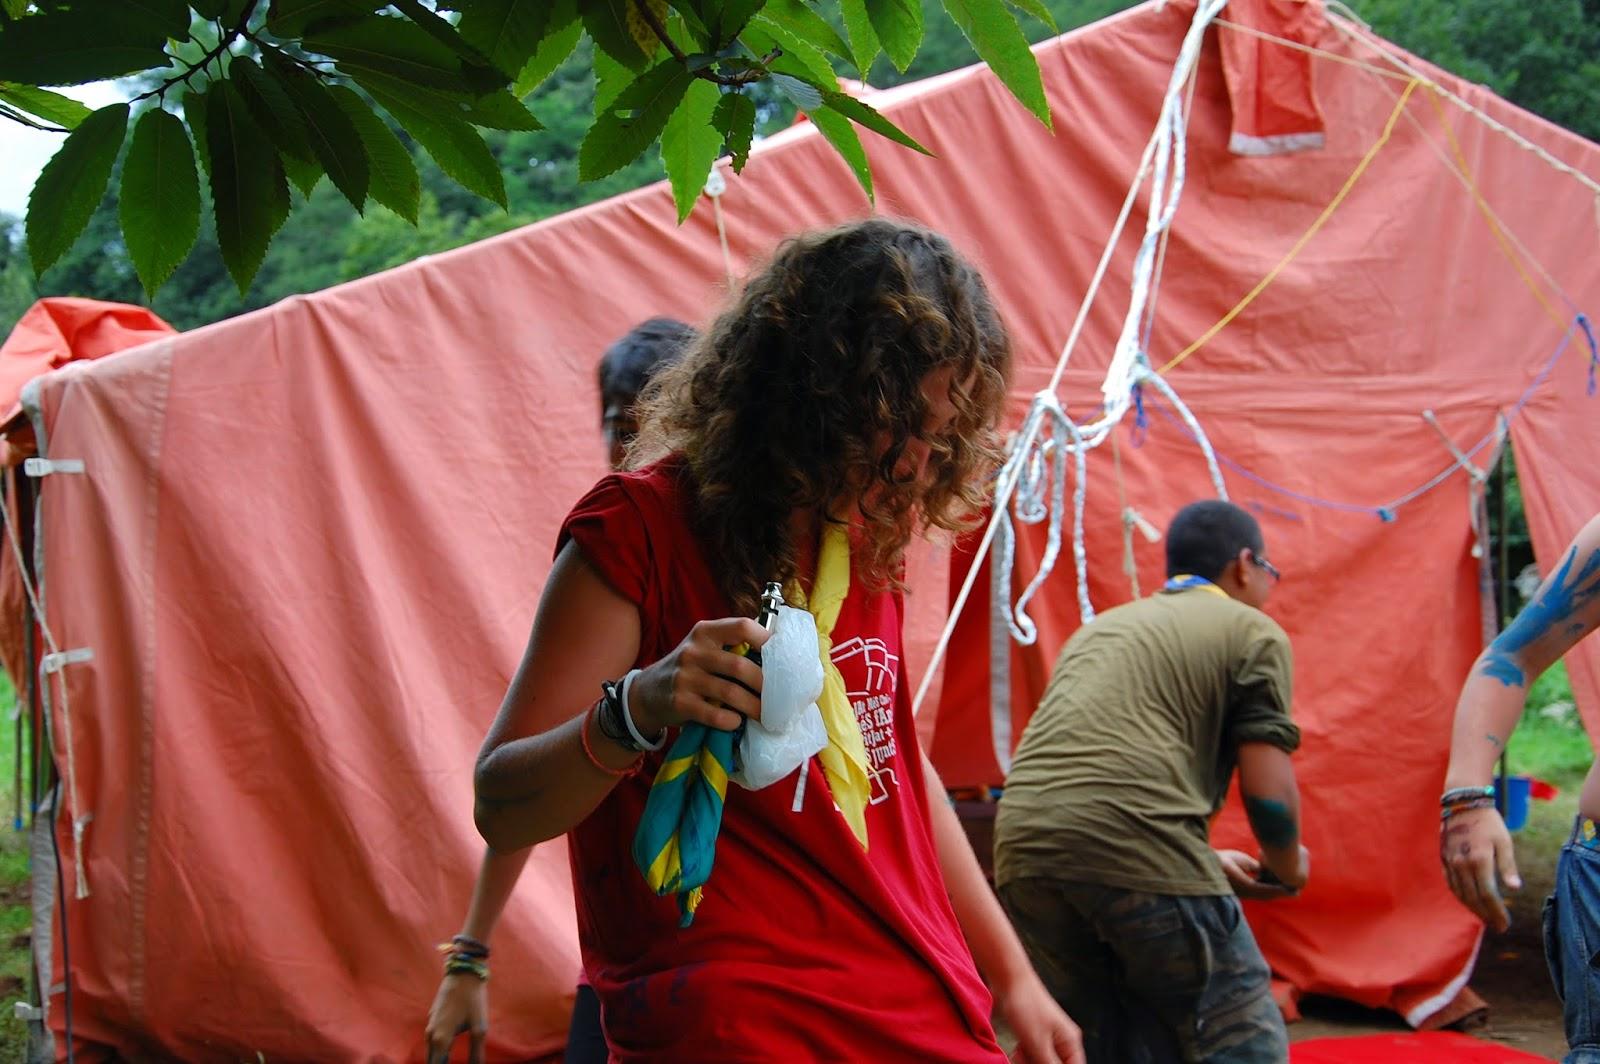 Campaments Estiu RolandKing 2011 - DSC_0345.JPG